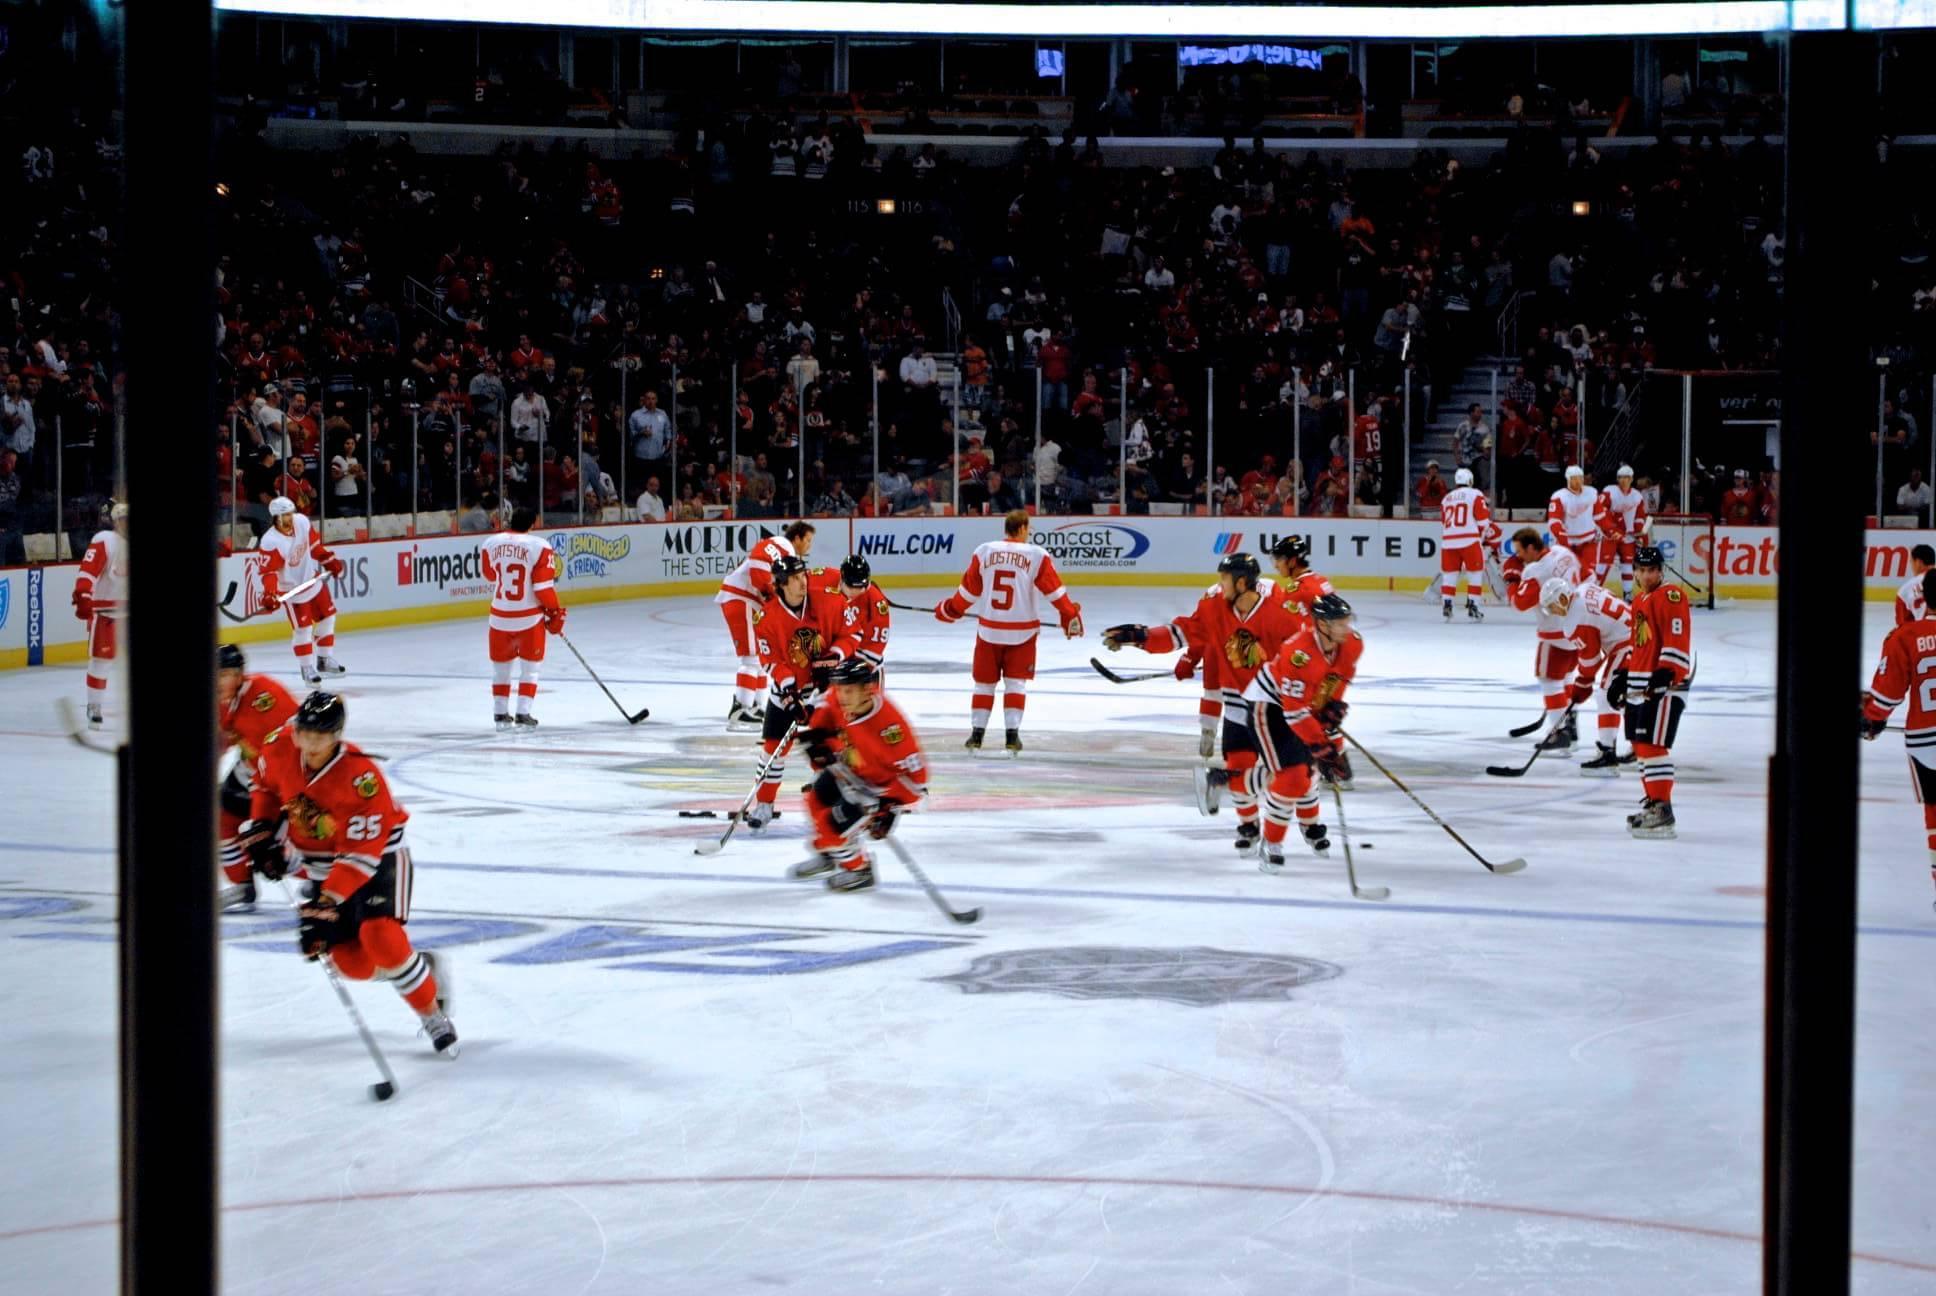 Detroit Red Wings vs Chicago Blackhawks NHL hockey rivalry